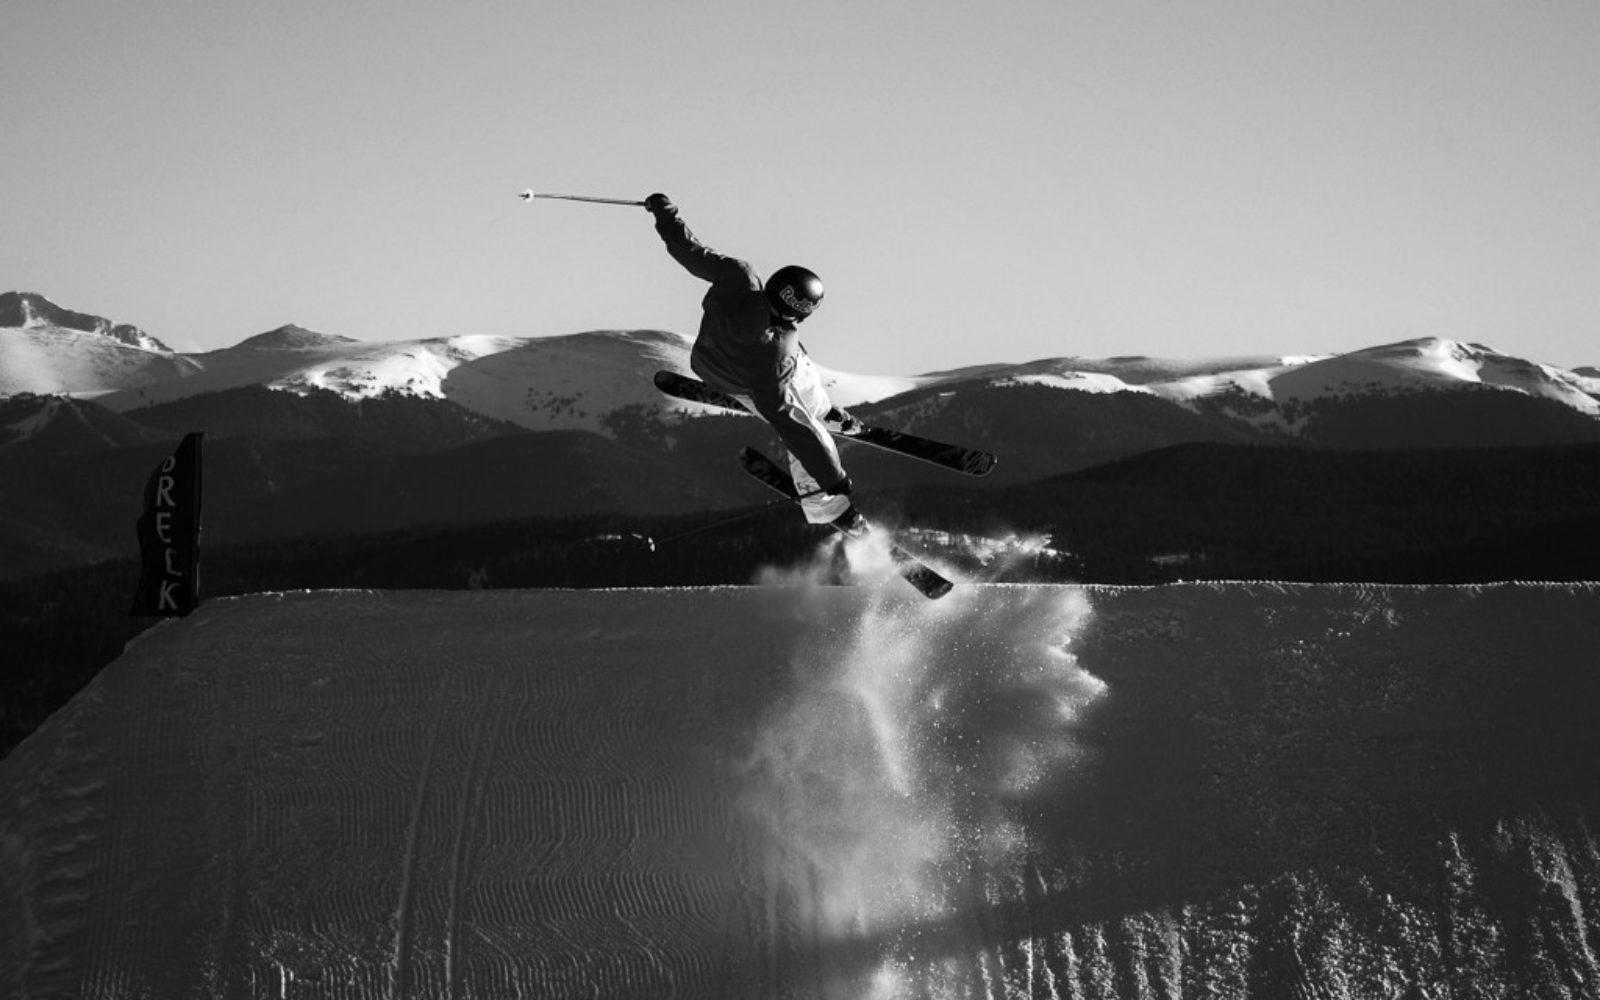 sports-xgames-skier-blackwhite-1024x640